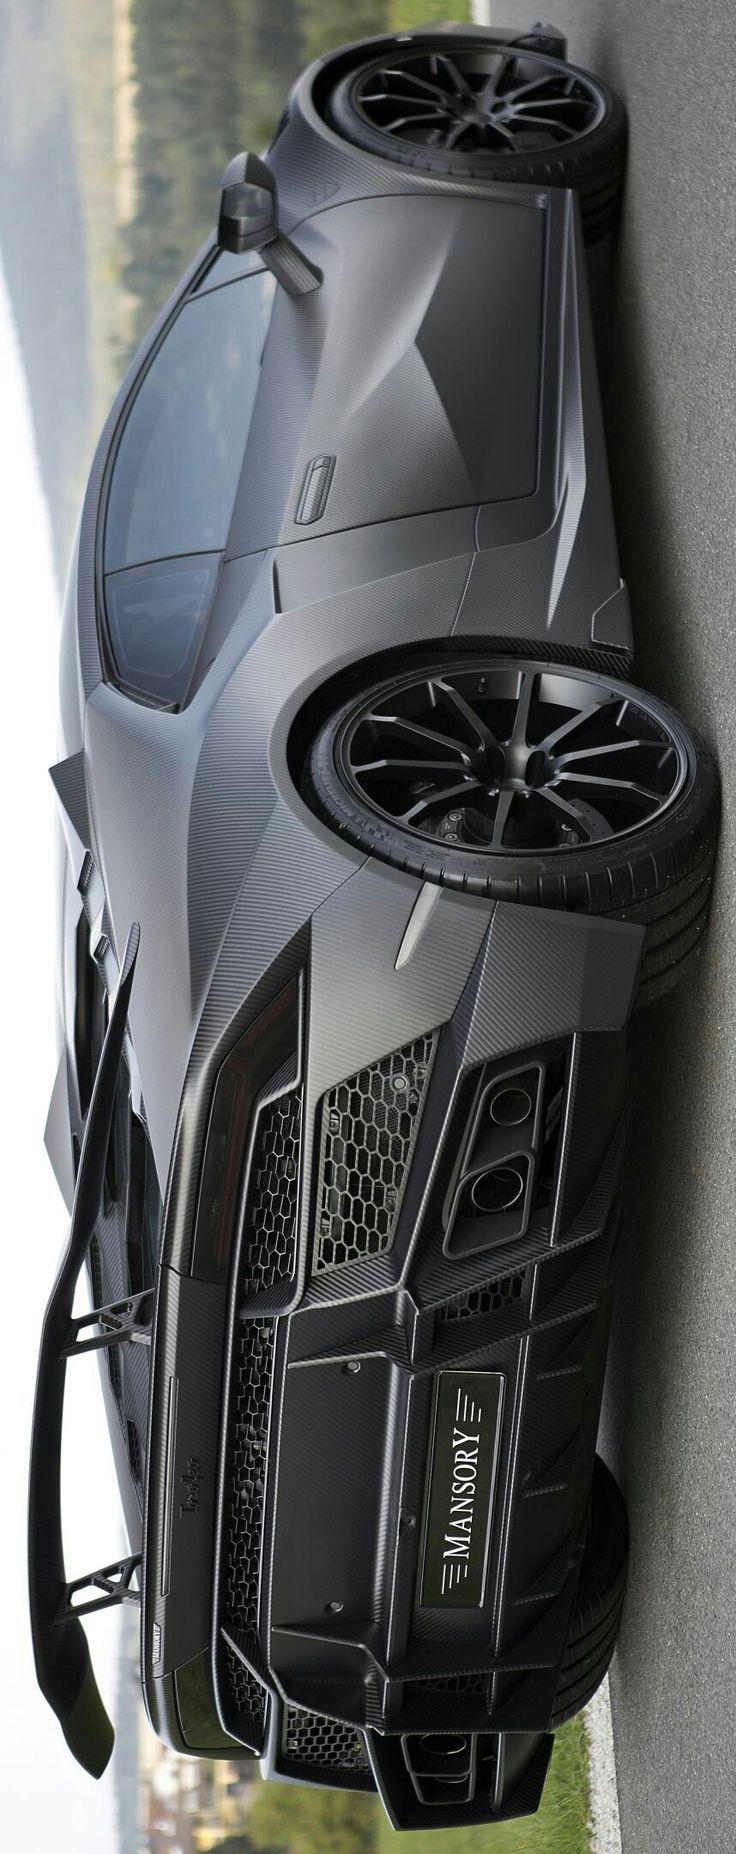 Awesome Lamborghini 2017: 2016 MANSORY TOROFEO Lamborghini Huracan... Car24 - World Bayers Check more at http://car24.top/2017/2017/01/25/lamborghini-2017-2016-mansory-torofeo-lamborghini-huracan-car24-world-bayers/